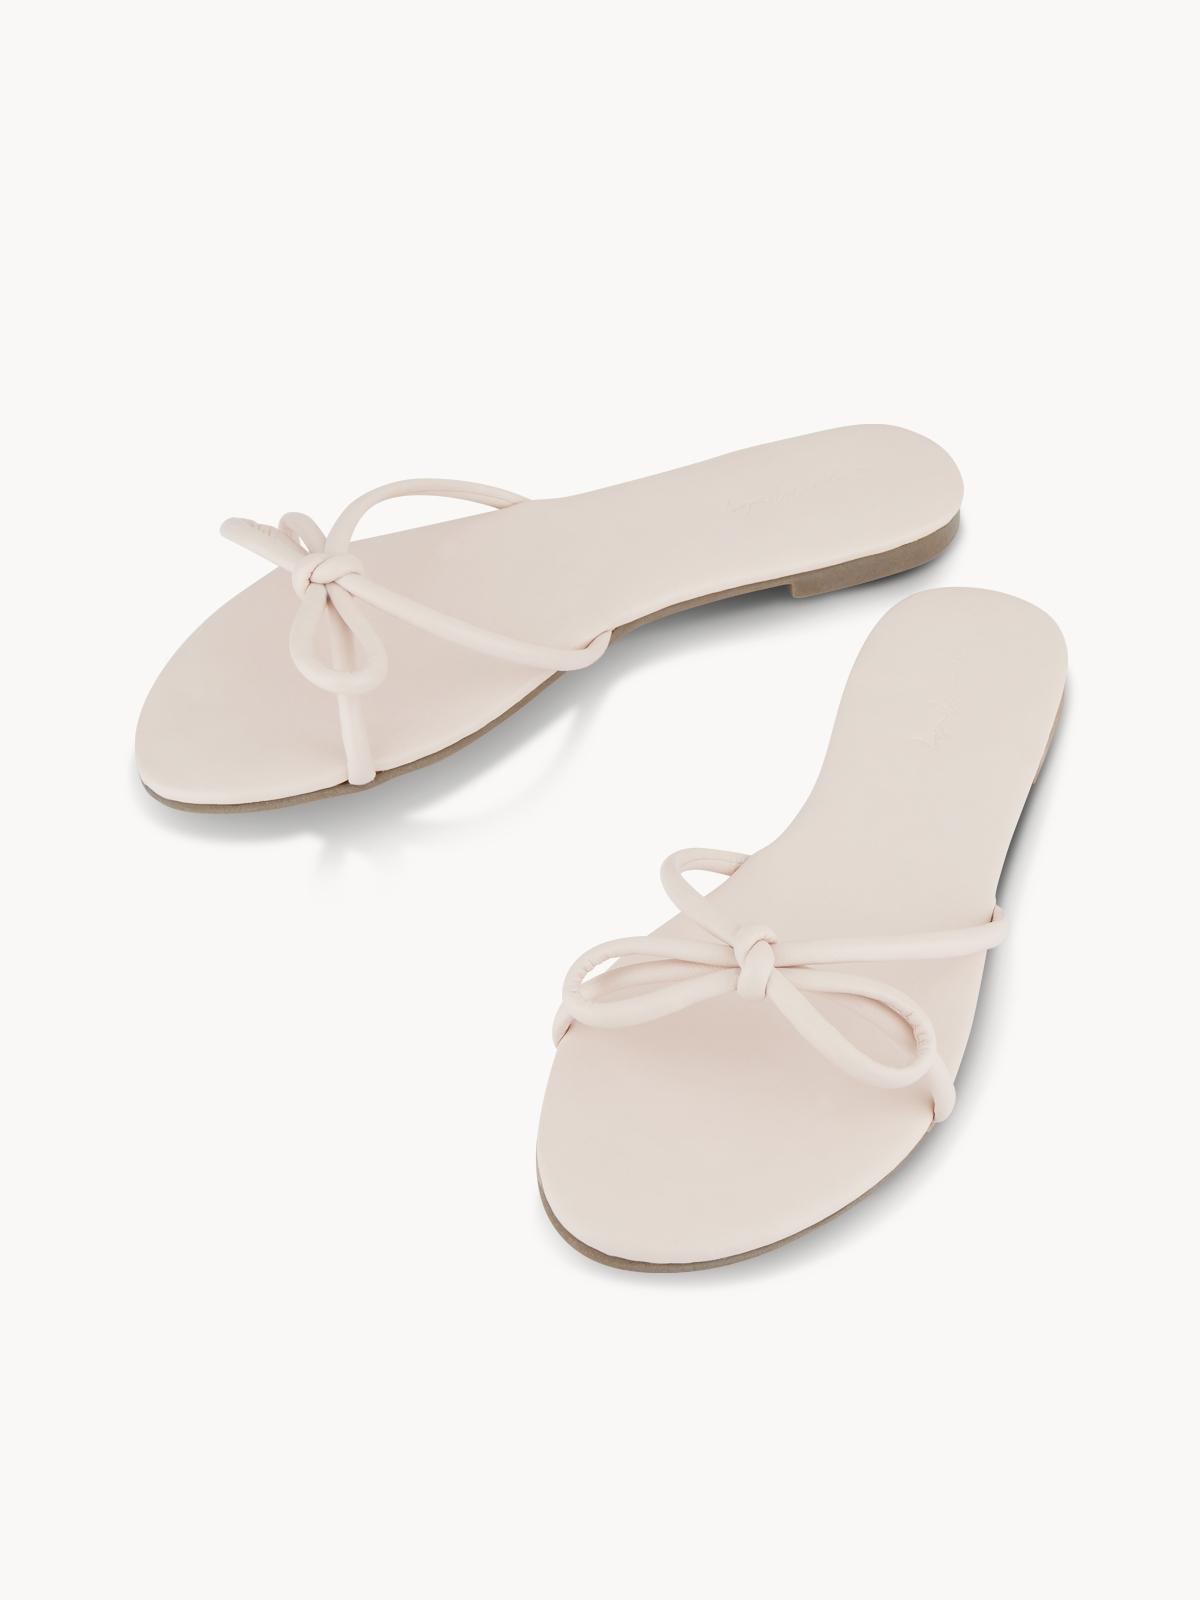 Sugar Monday Mimi Bow Flip Flops Pink